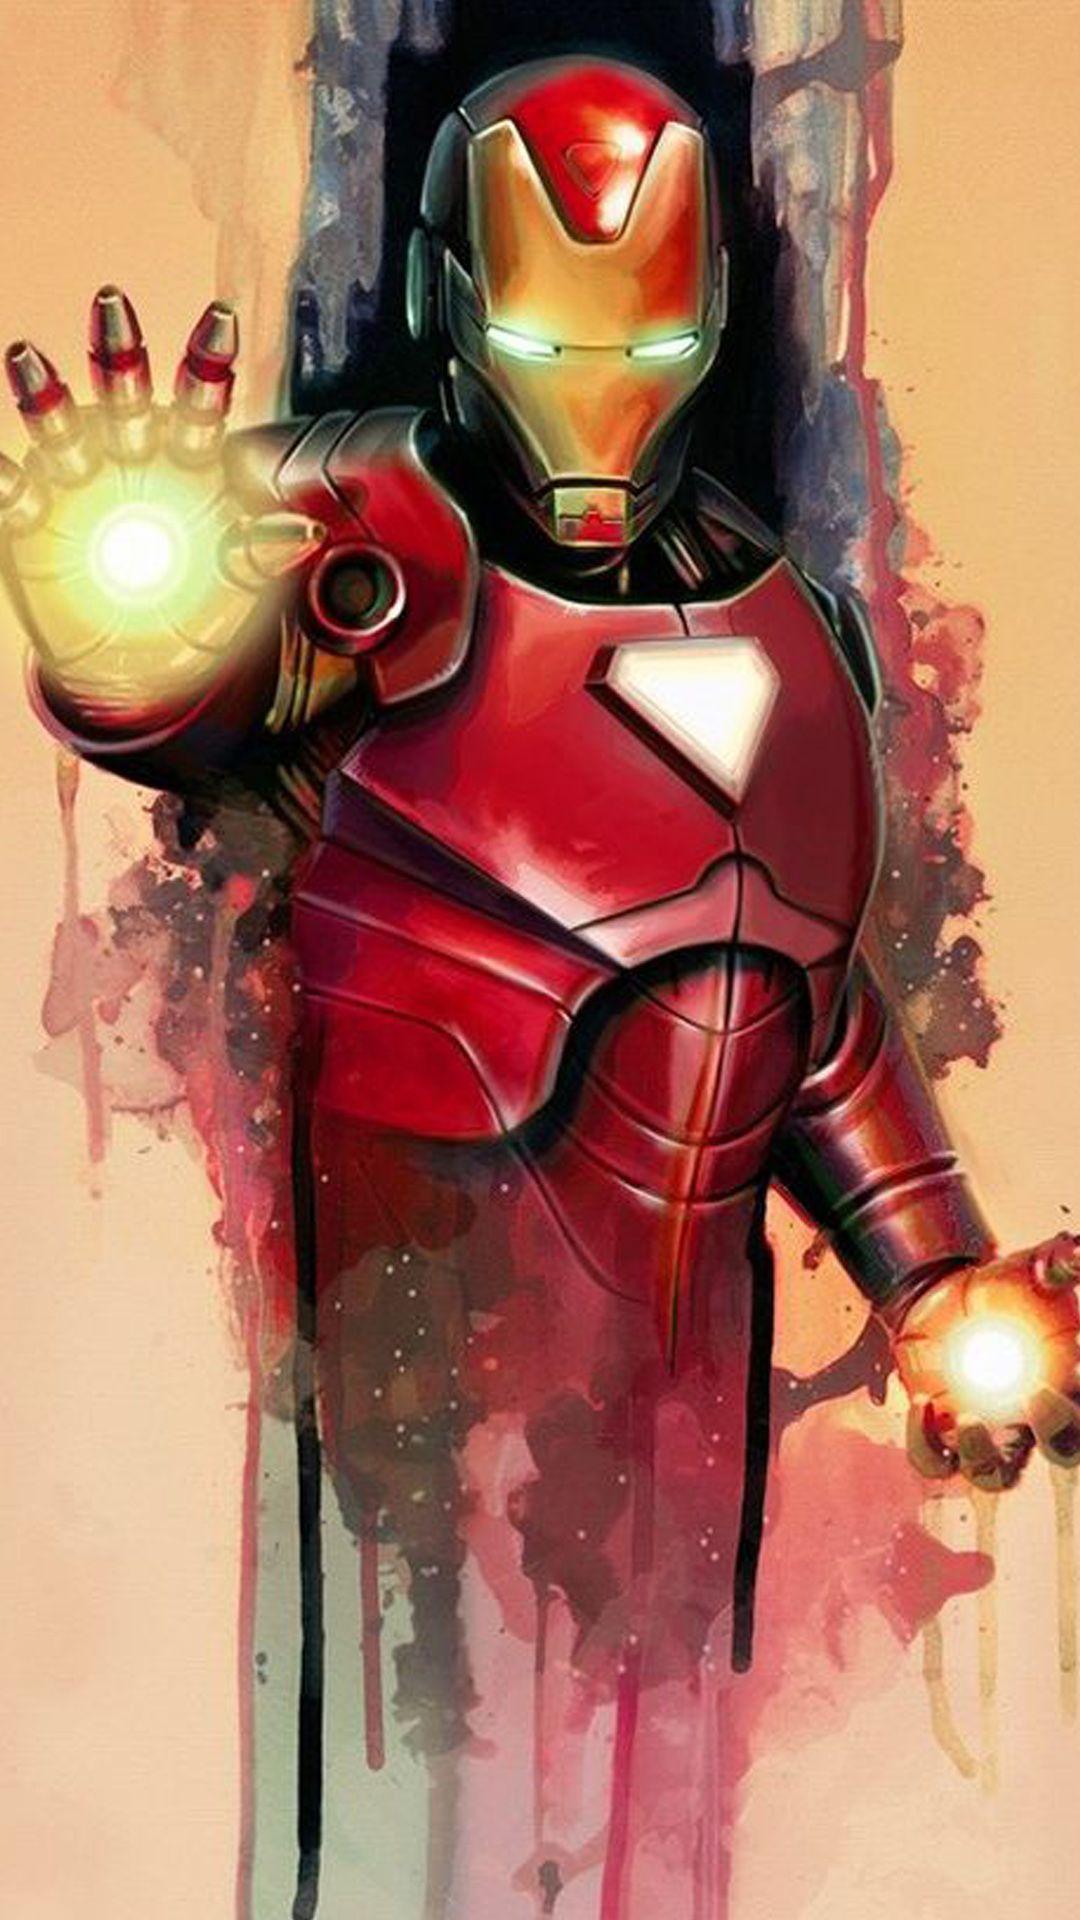 Iron Man Phone Wallpapers Iphone Wallru Com Marvel Iron Man Iron Man Art Iron Man